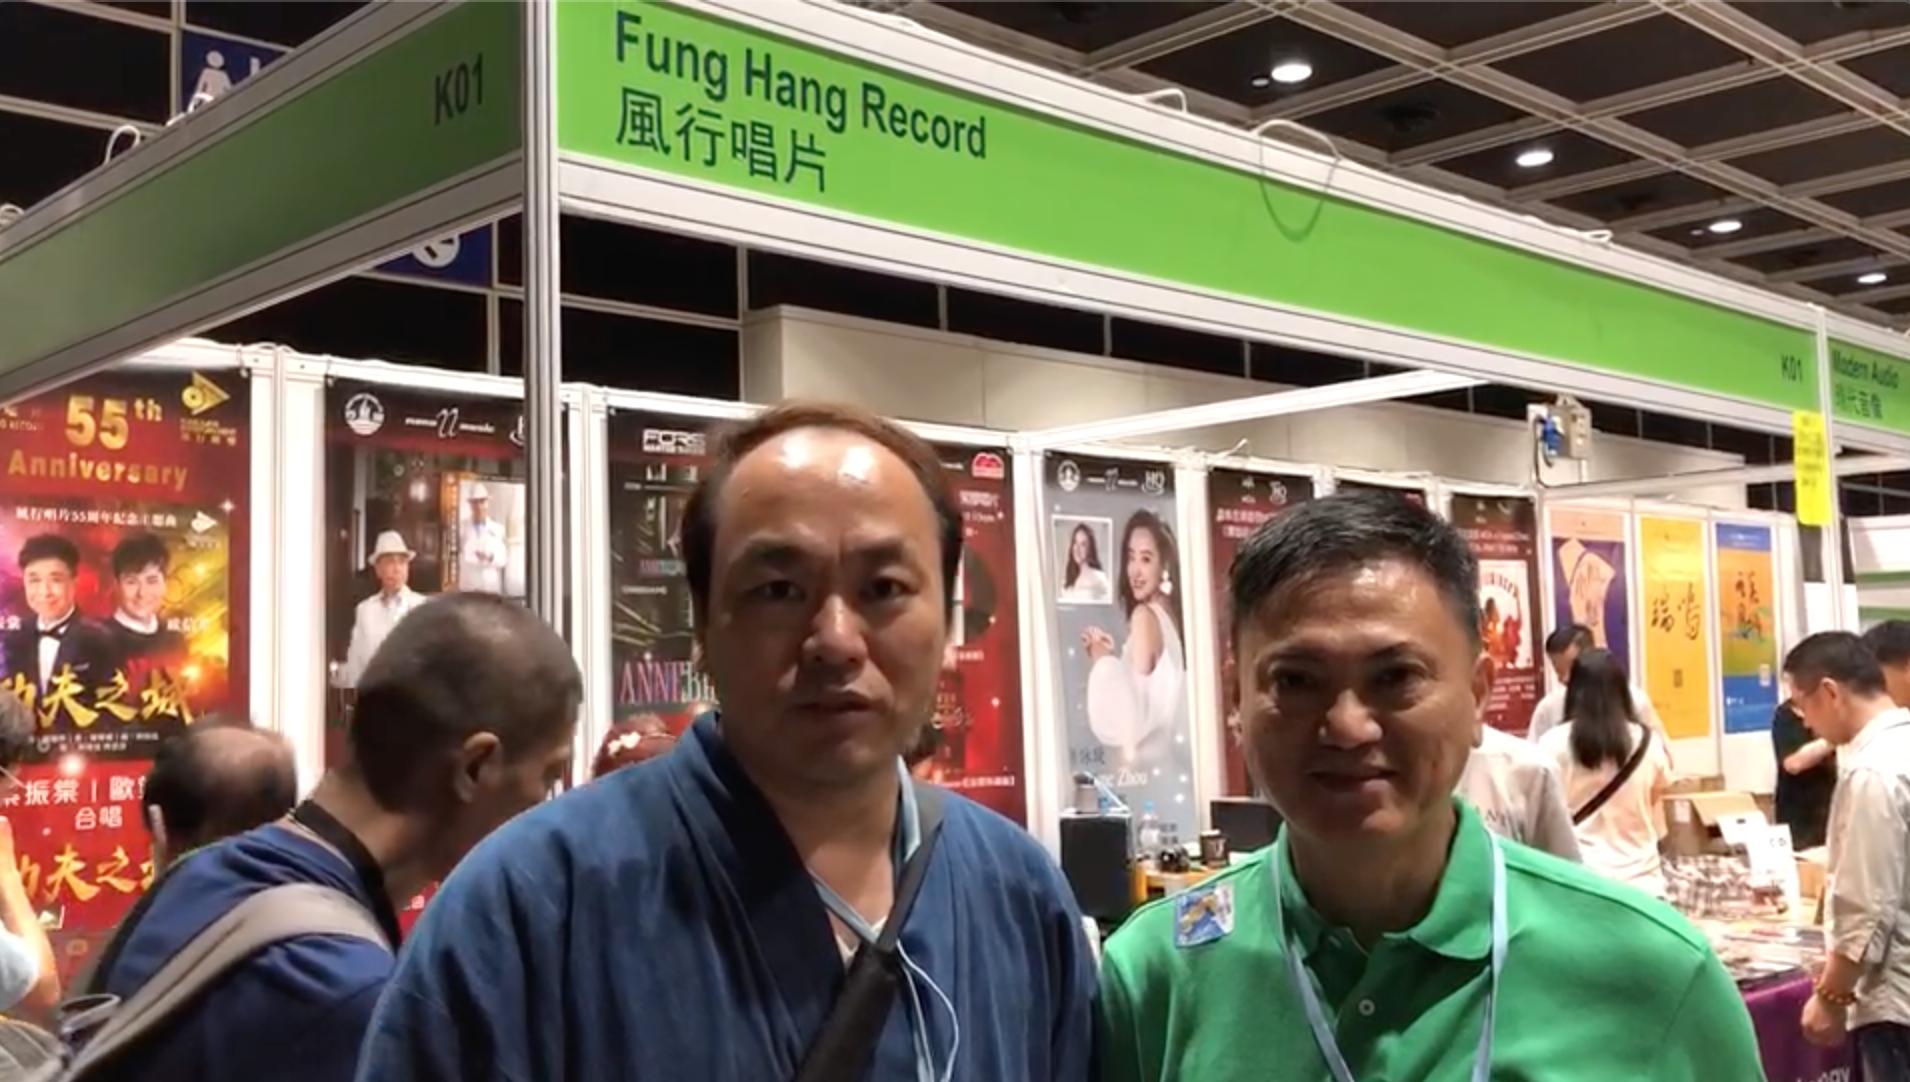 FJ時事新聞社長江東良一於灣仔會展中心採訪香港風行唱片公司陳經理